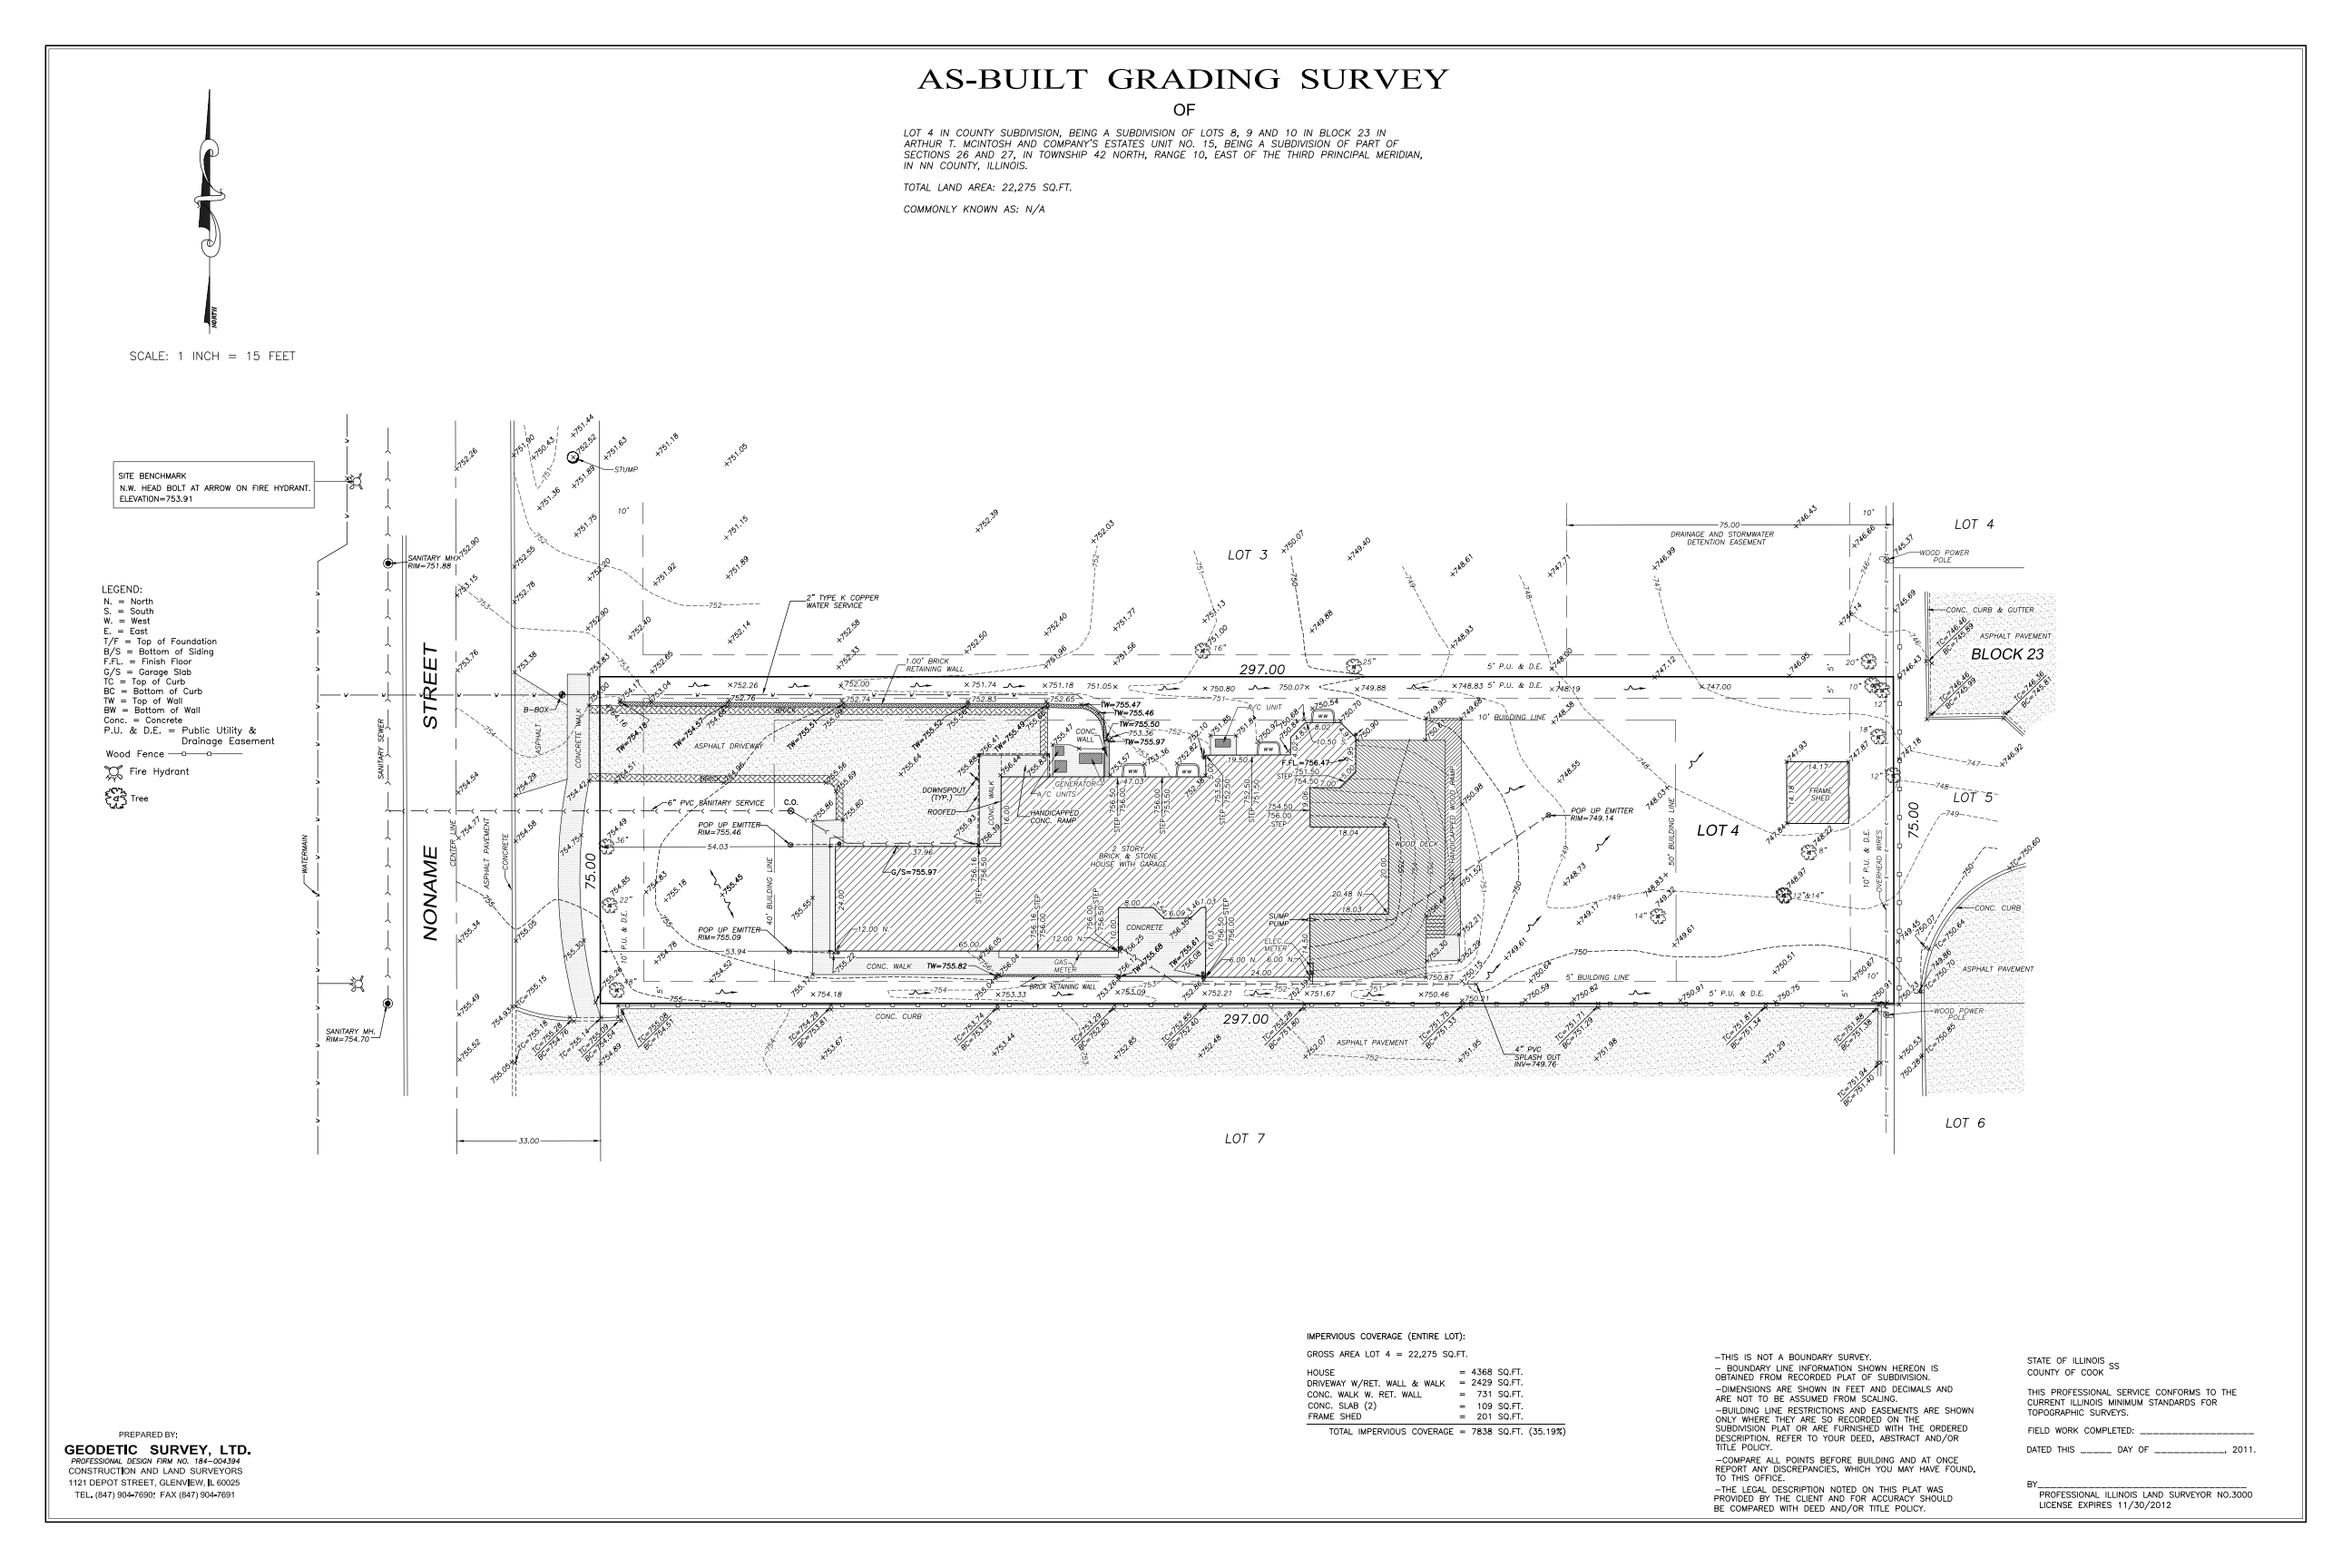 ASBUILT GRADING SURVEY_001